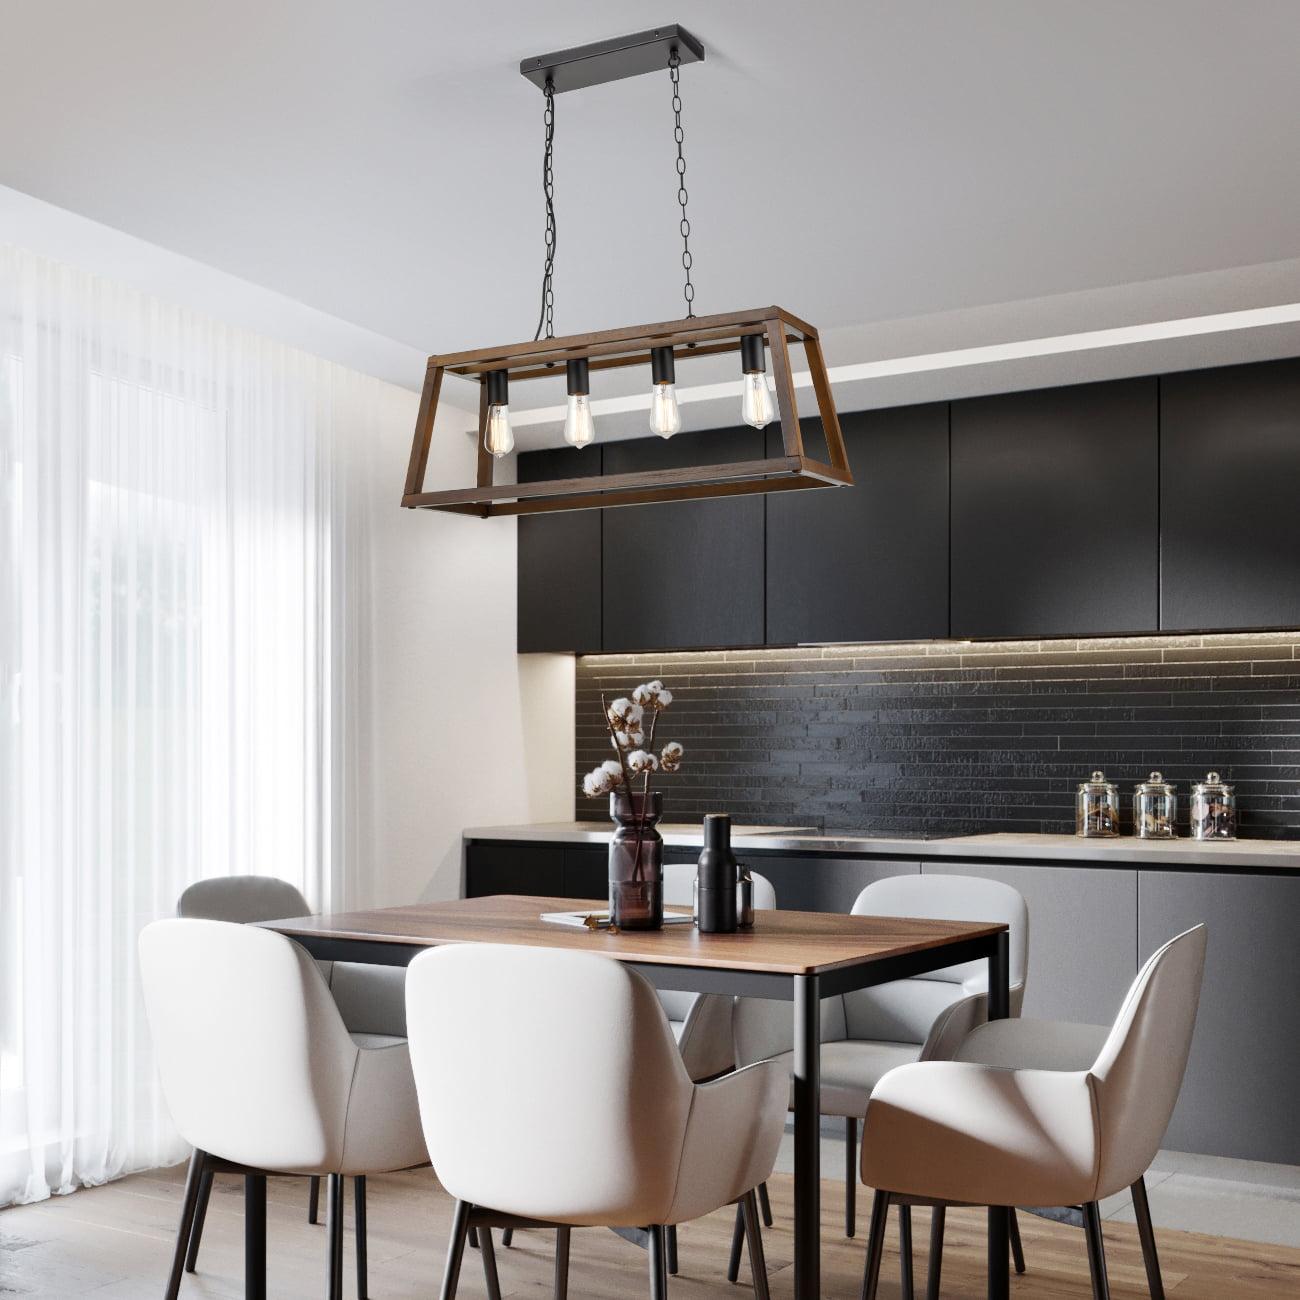 Light Society Walnut Wood Bristol Pendant Lamp Chandelier with Metal Chain Modern Industrial Style